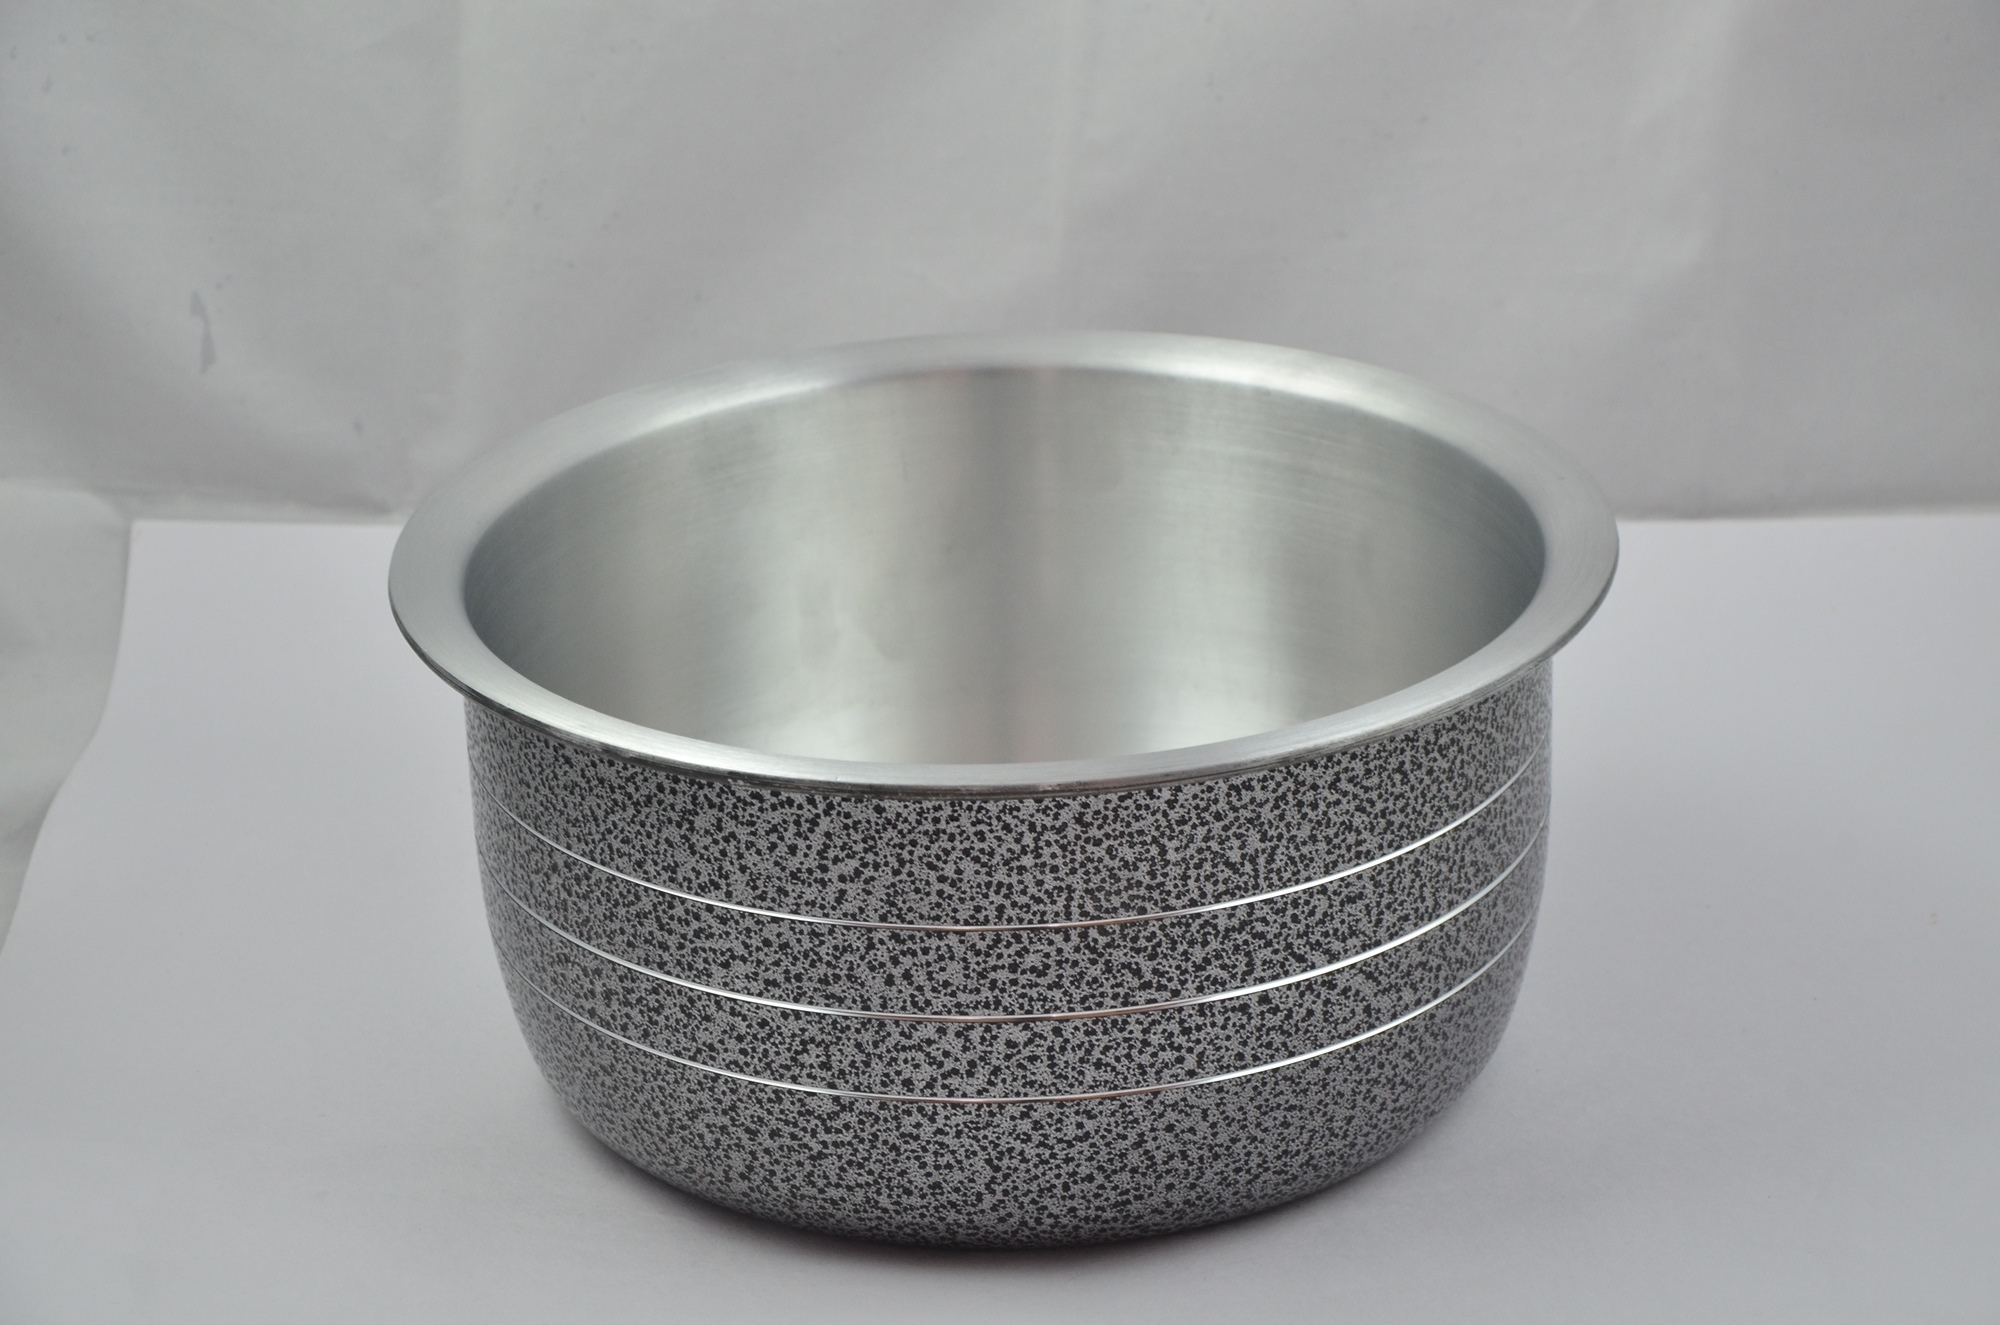 Aluminum Black Coating Top